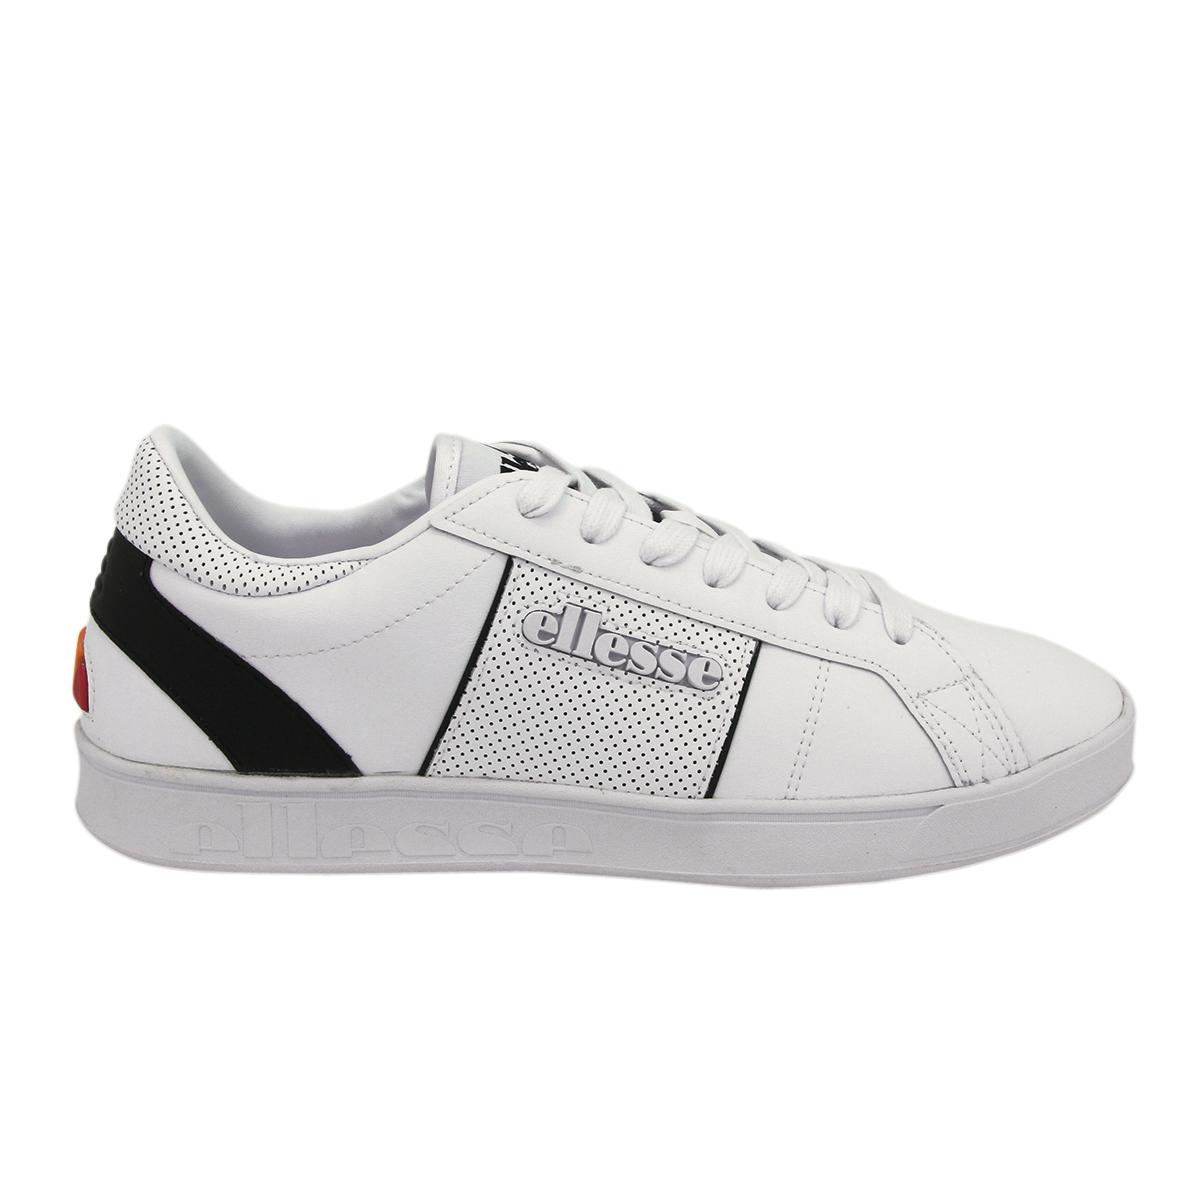 Ellesse ls-80 Cuir Hommes Baskets Chaussures NEUF